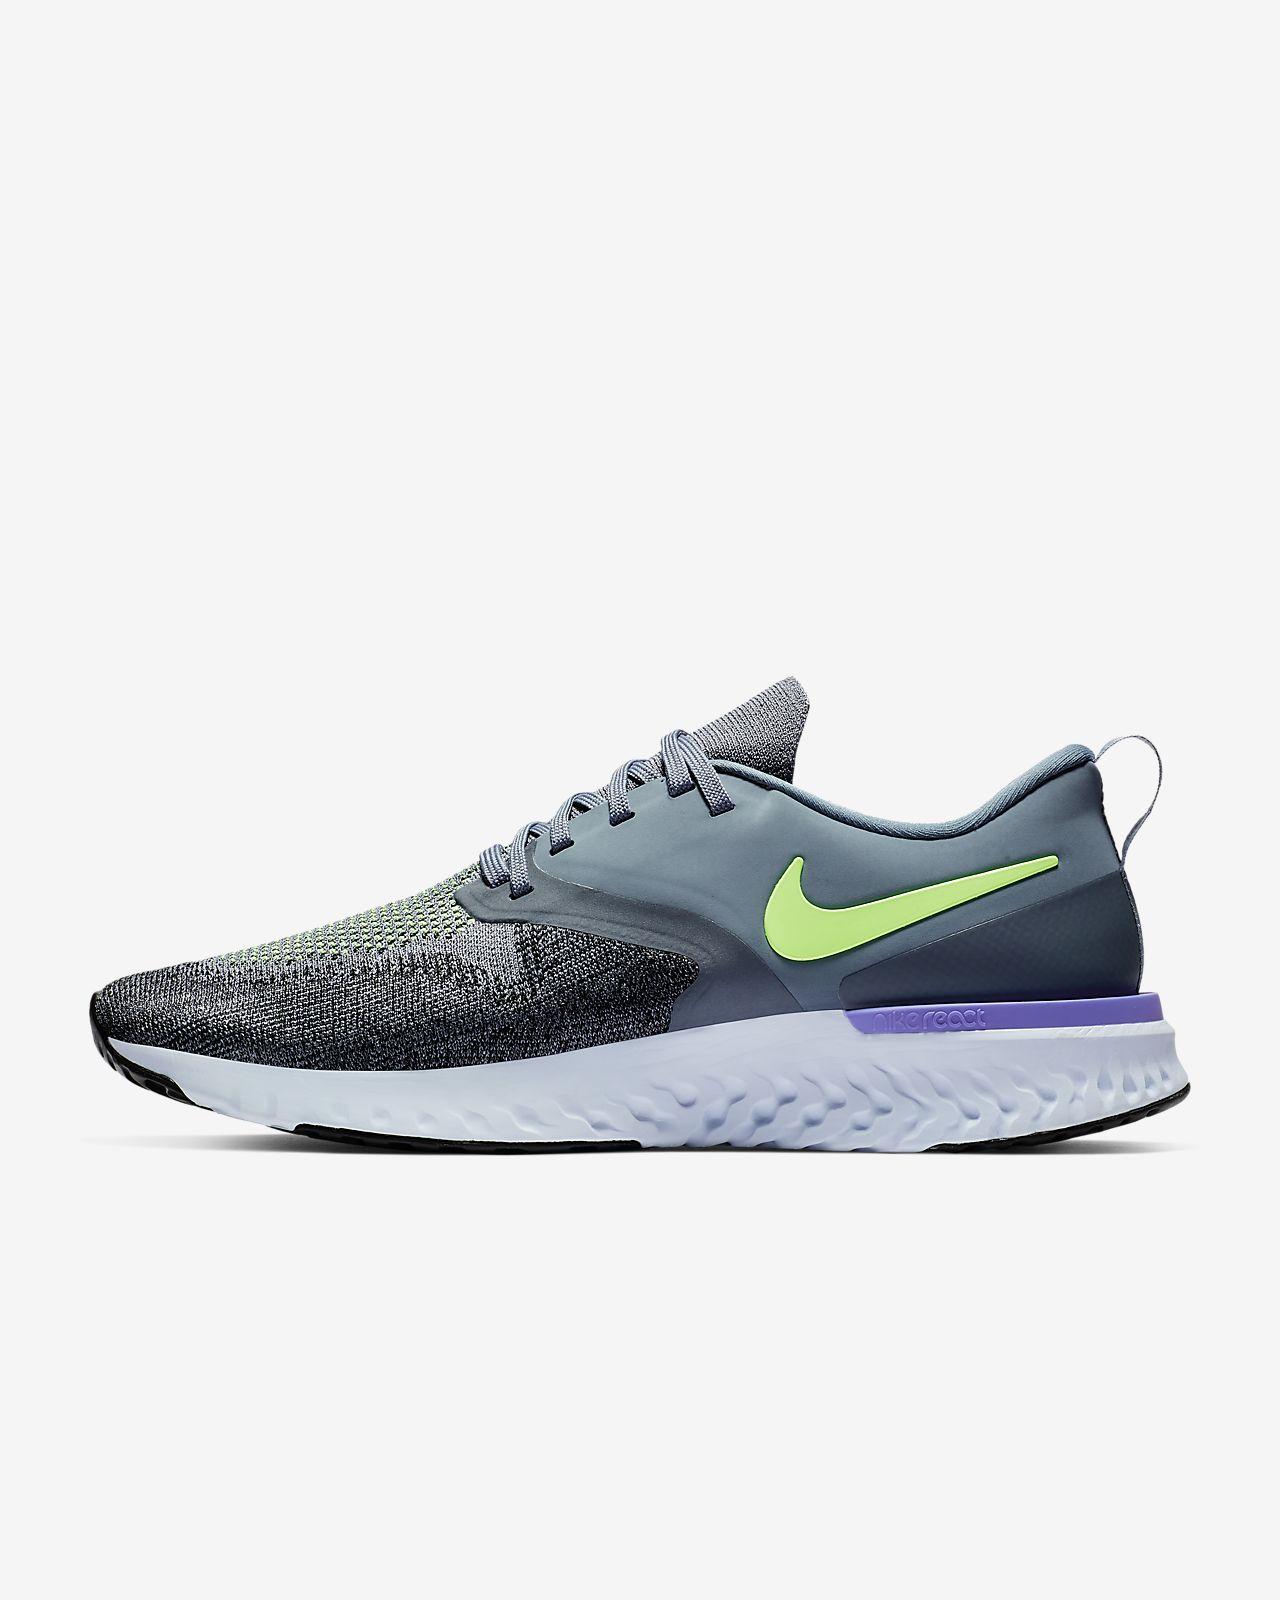 separation shoes 94dcf 835d0 Uomo Odyssey Ch 2 Flyknit Scarpa Da React Running Nike wqxcaS0v